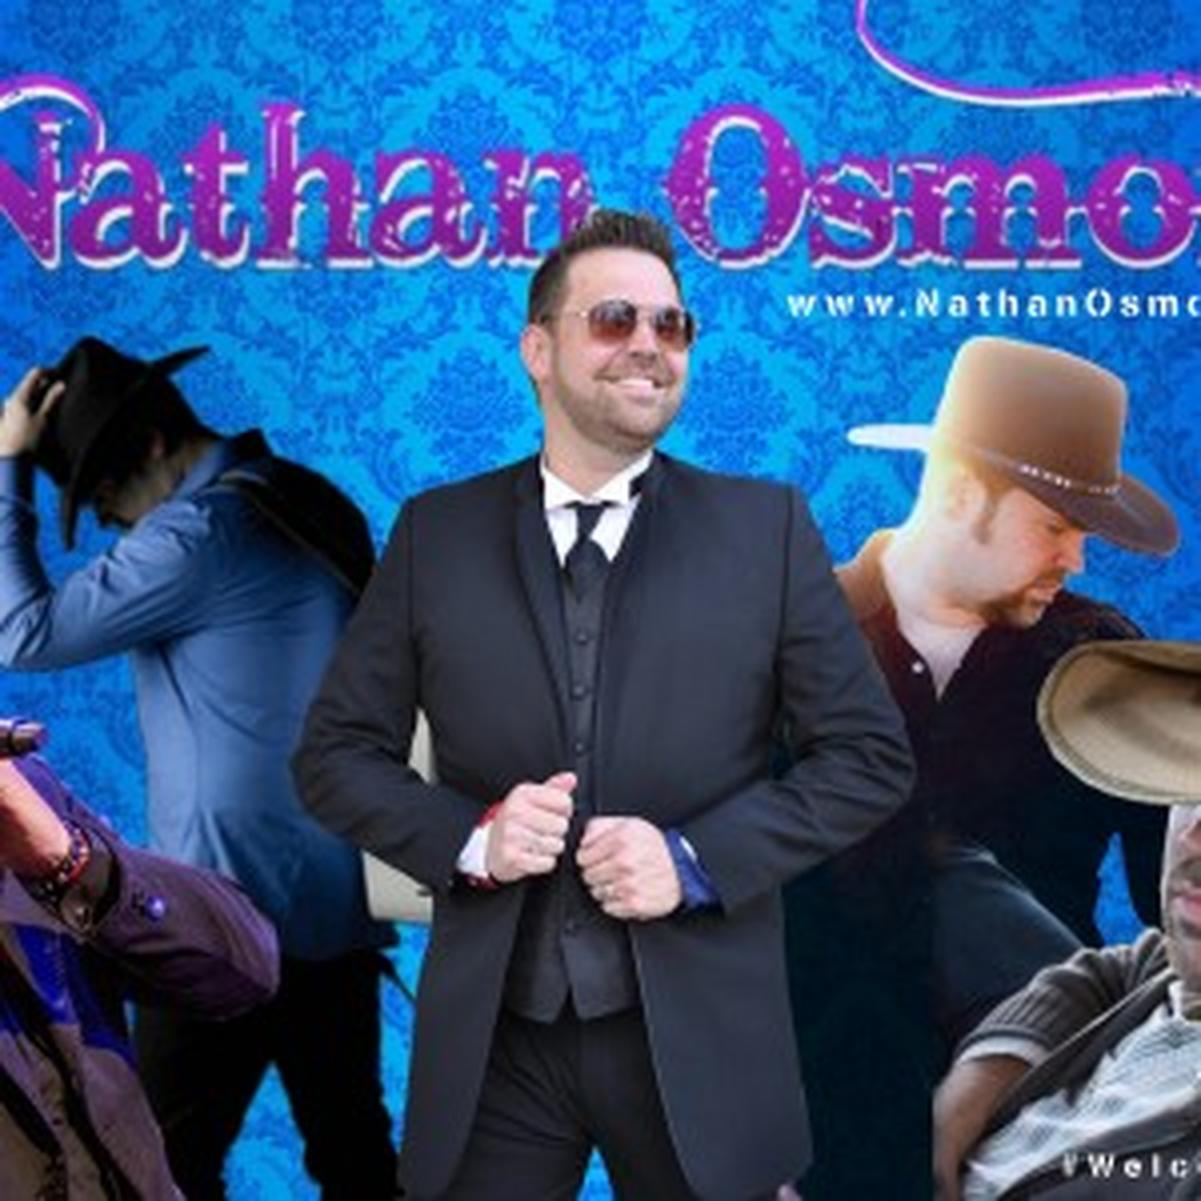 Nathan Osmond wiki, Nathan Osmond review, Nathan Osmond history, Nathan Osmond news